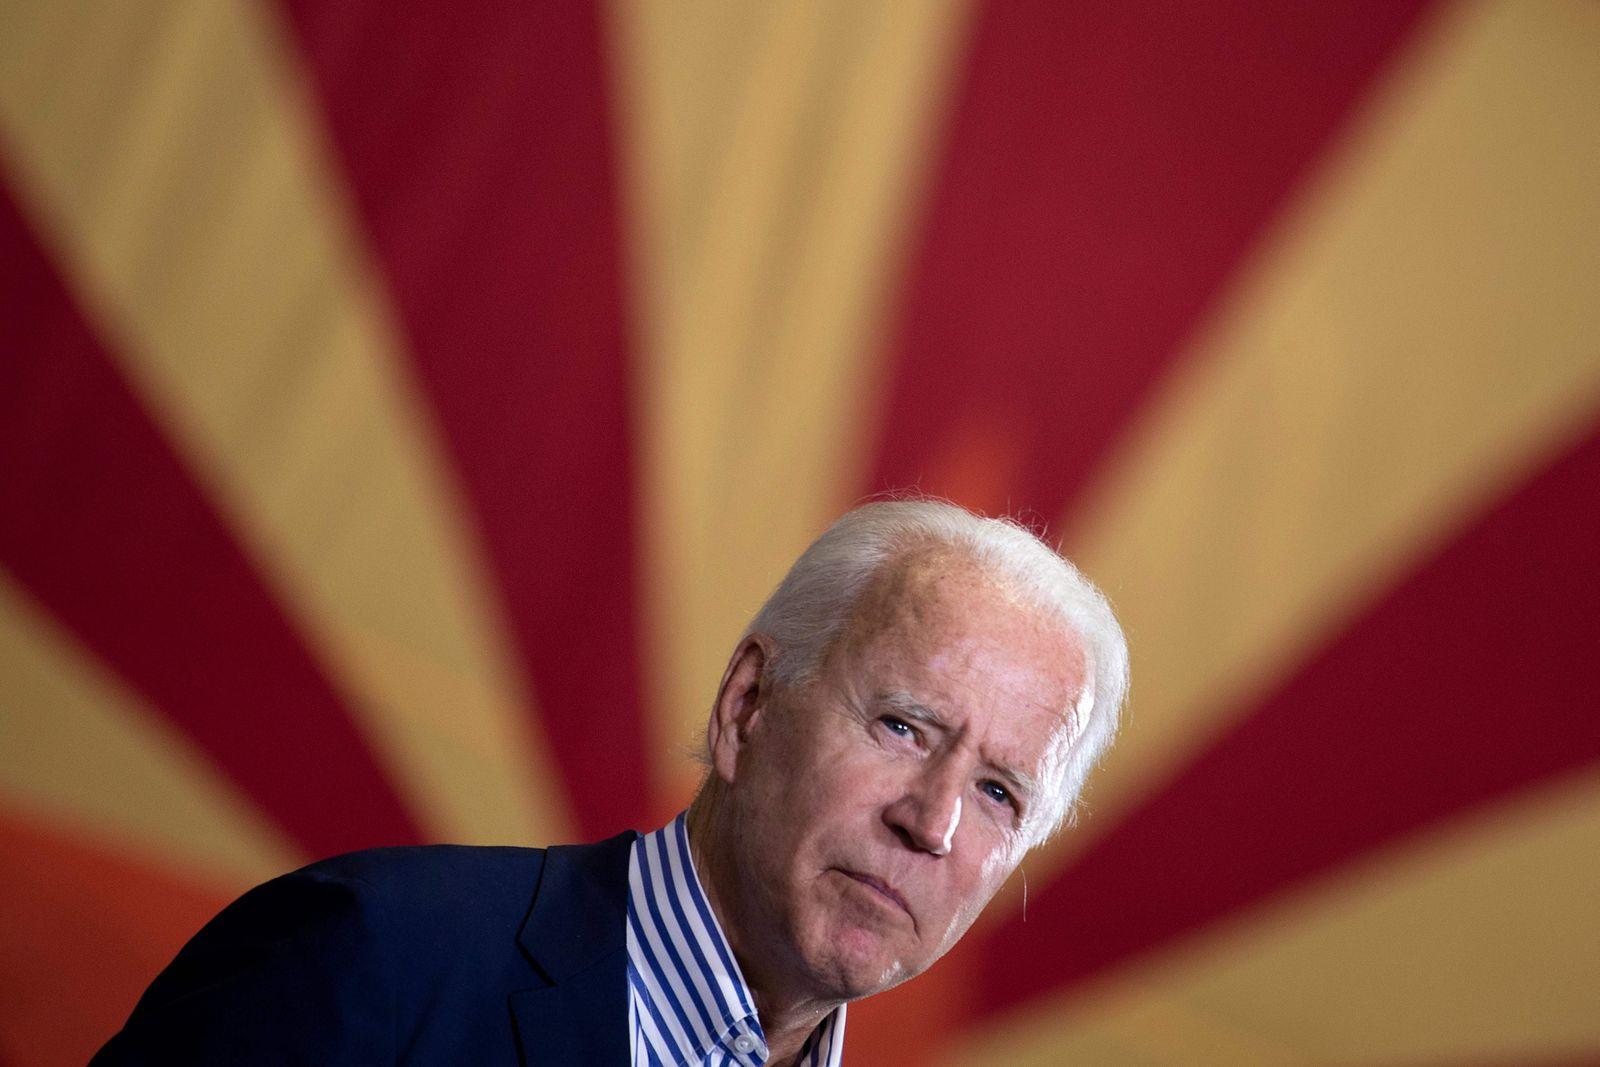 Arizona flips to Biden in first Democratic win in decades